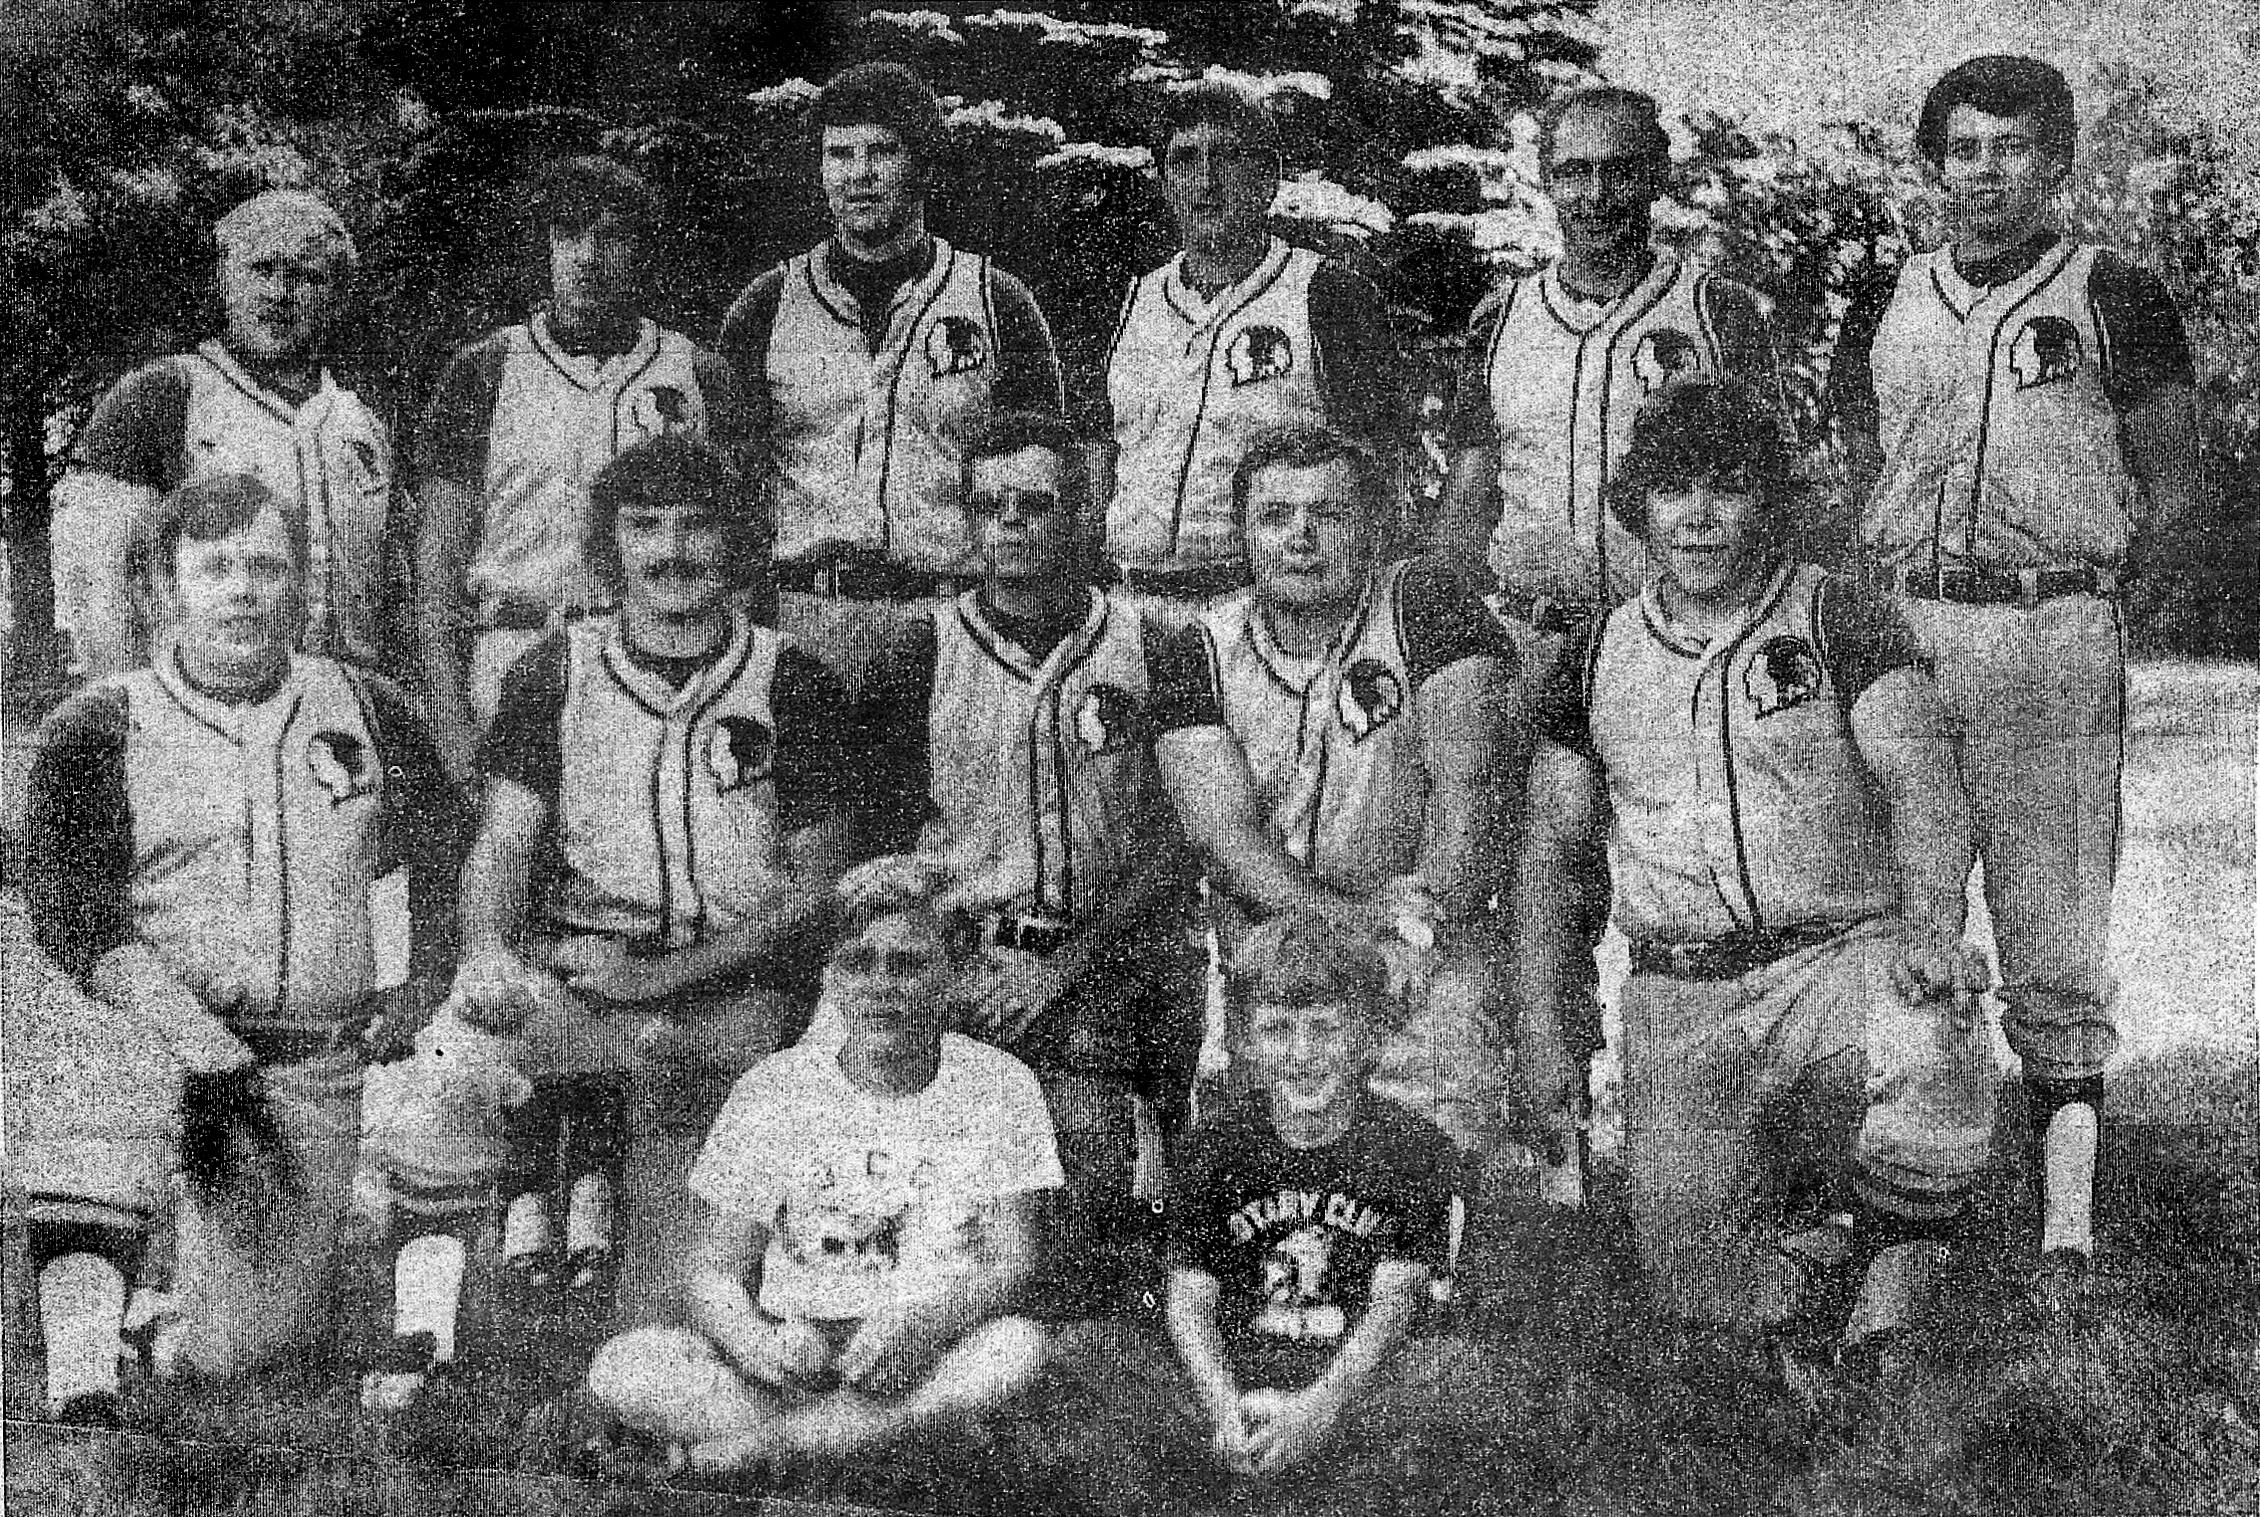 1973 Kewaunee Chiefs Shoreland Championship Team